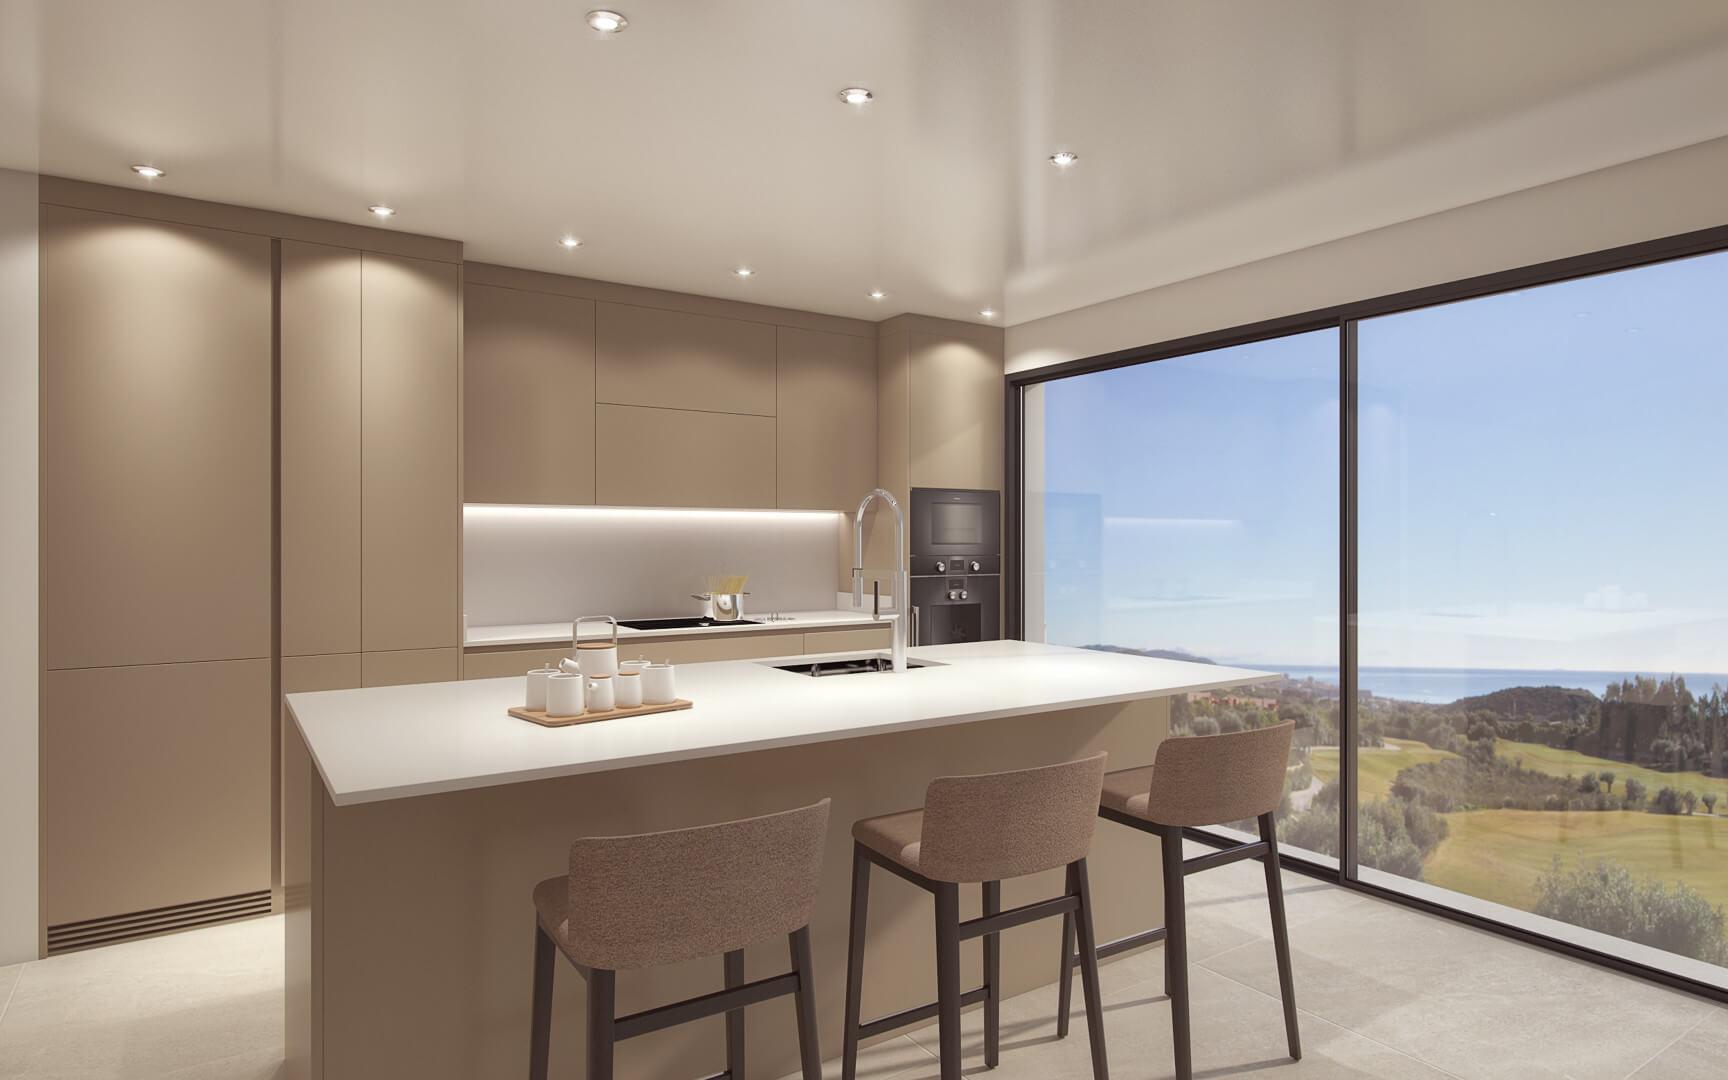 El campanario hills moderne boutique appartementen new golden mile